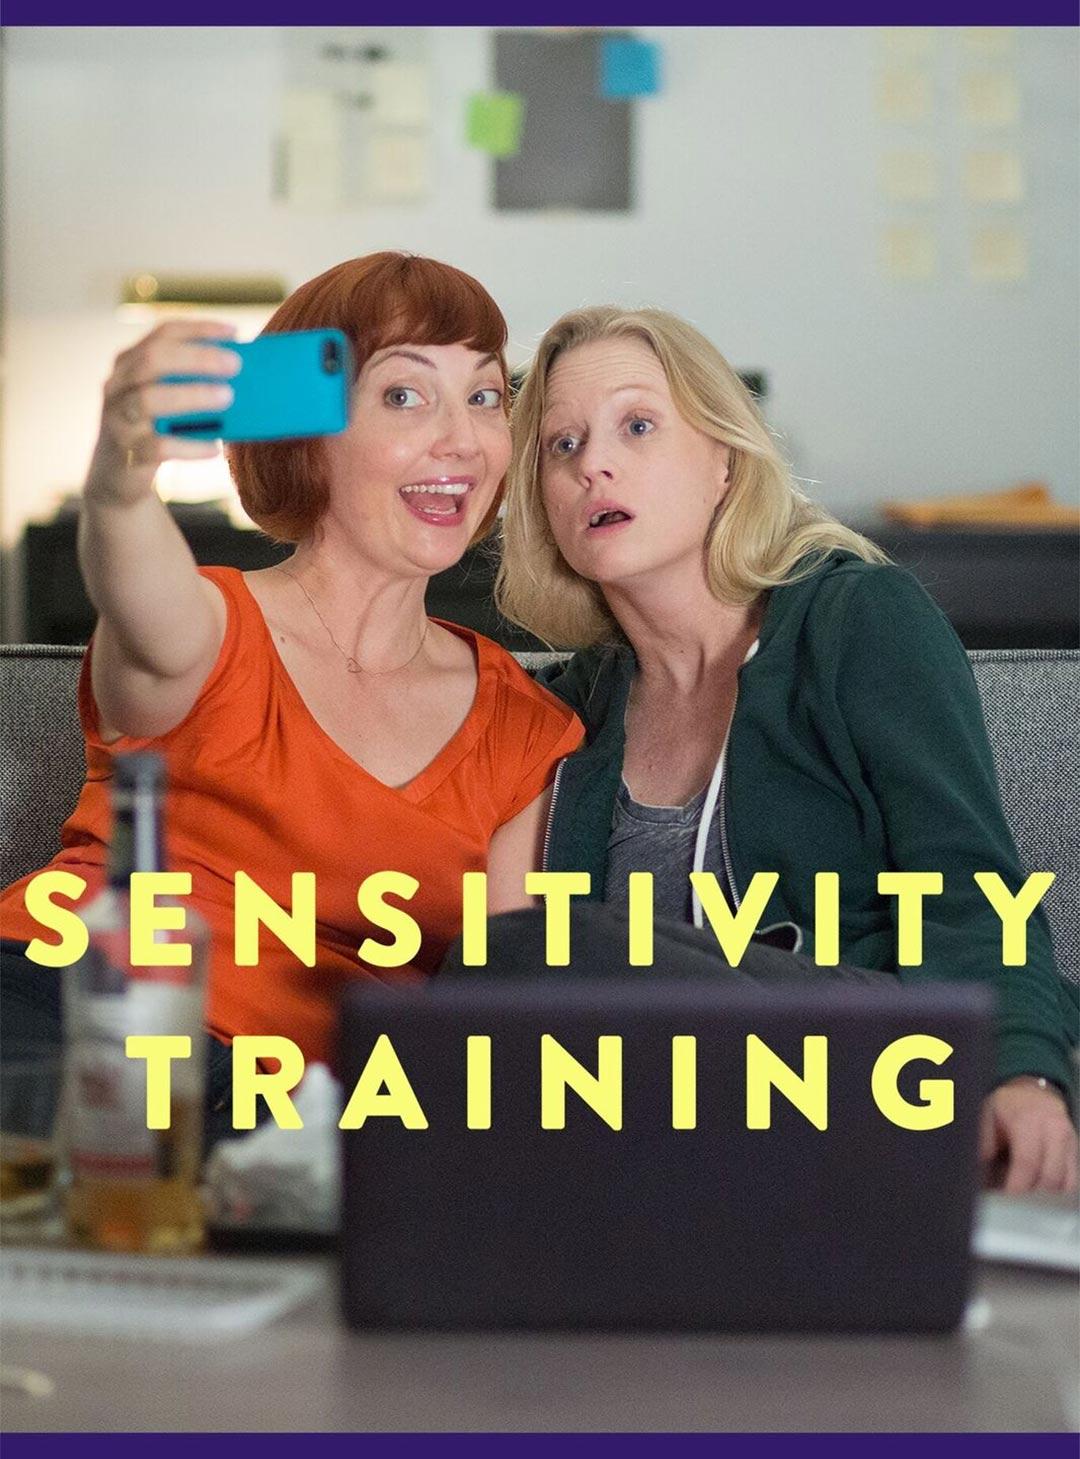 Sensitivity Training Poster #1